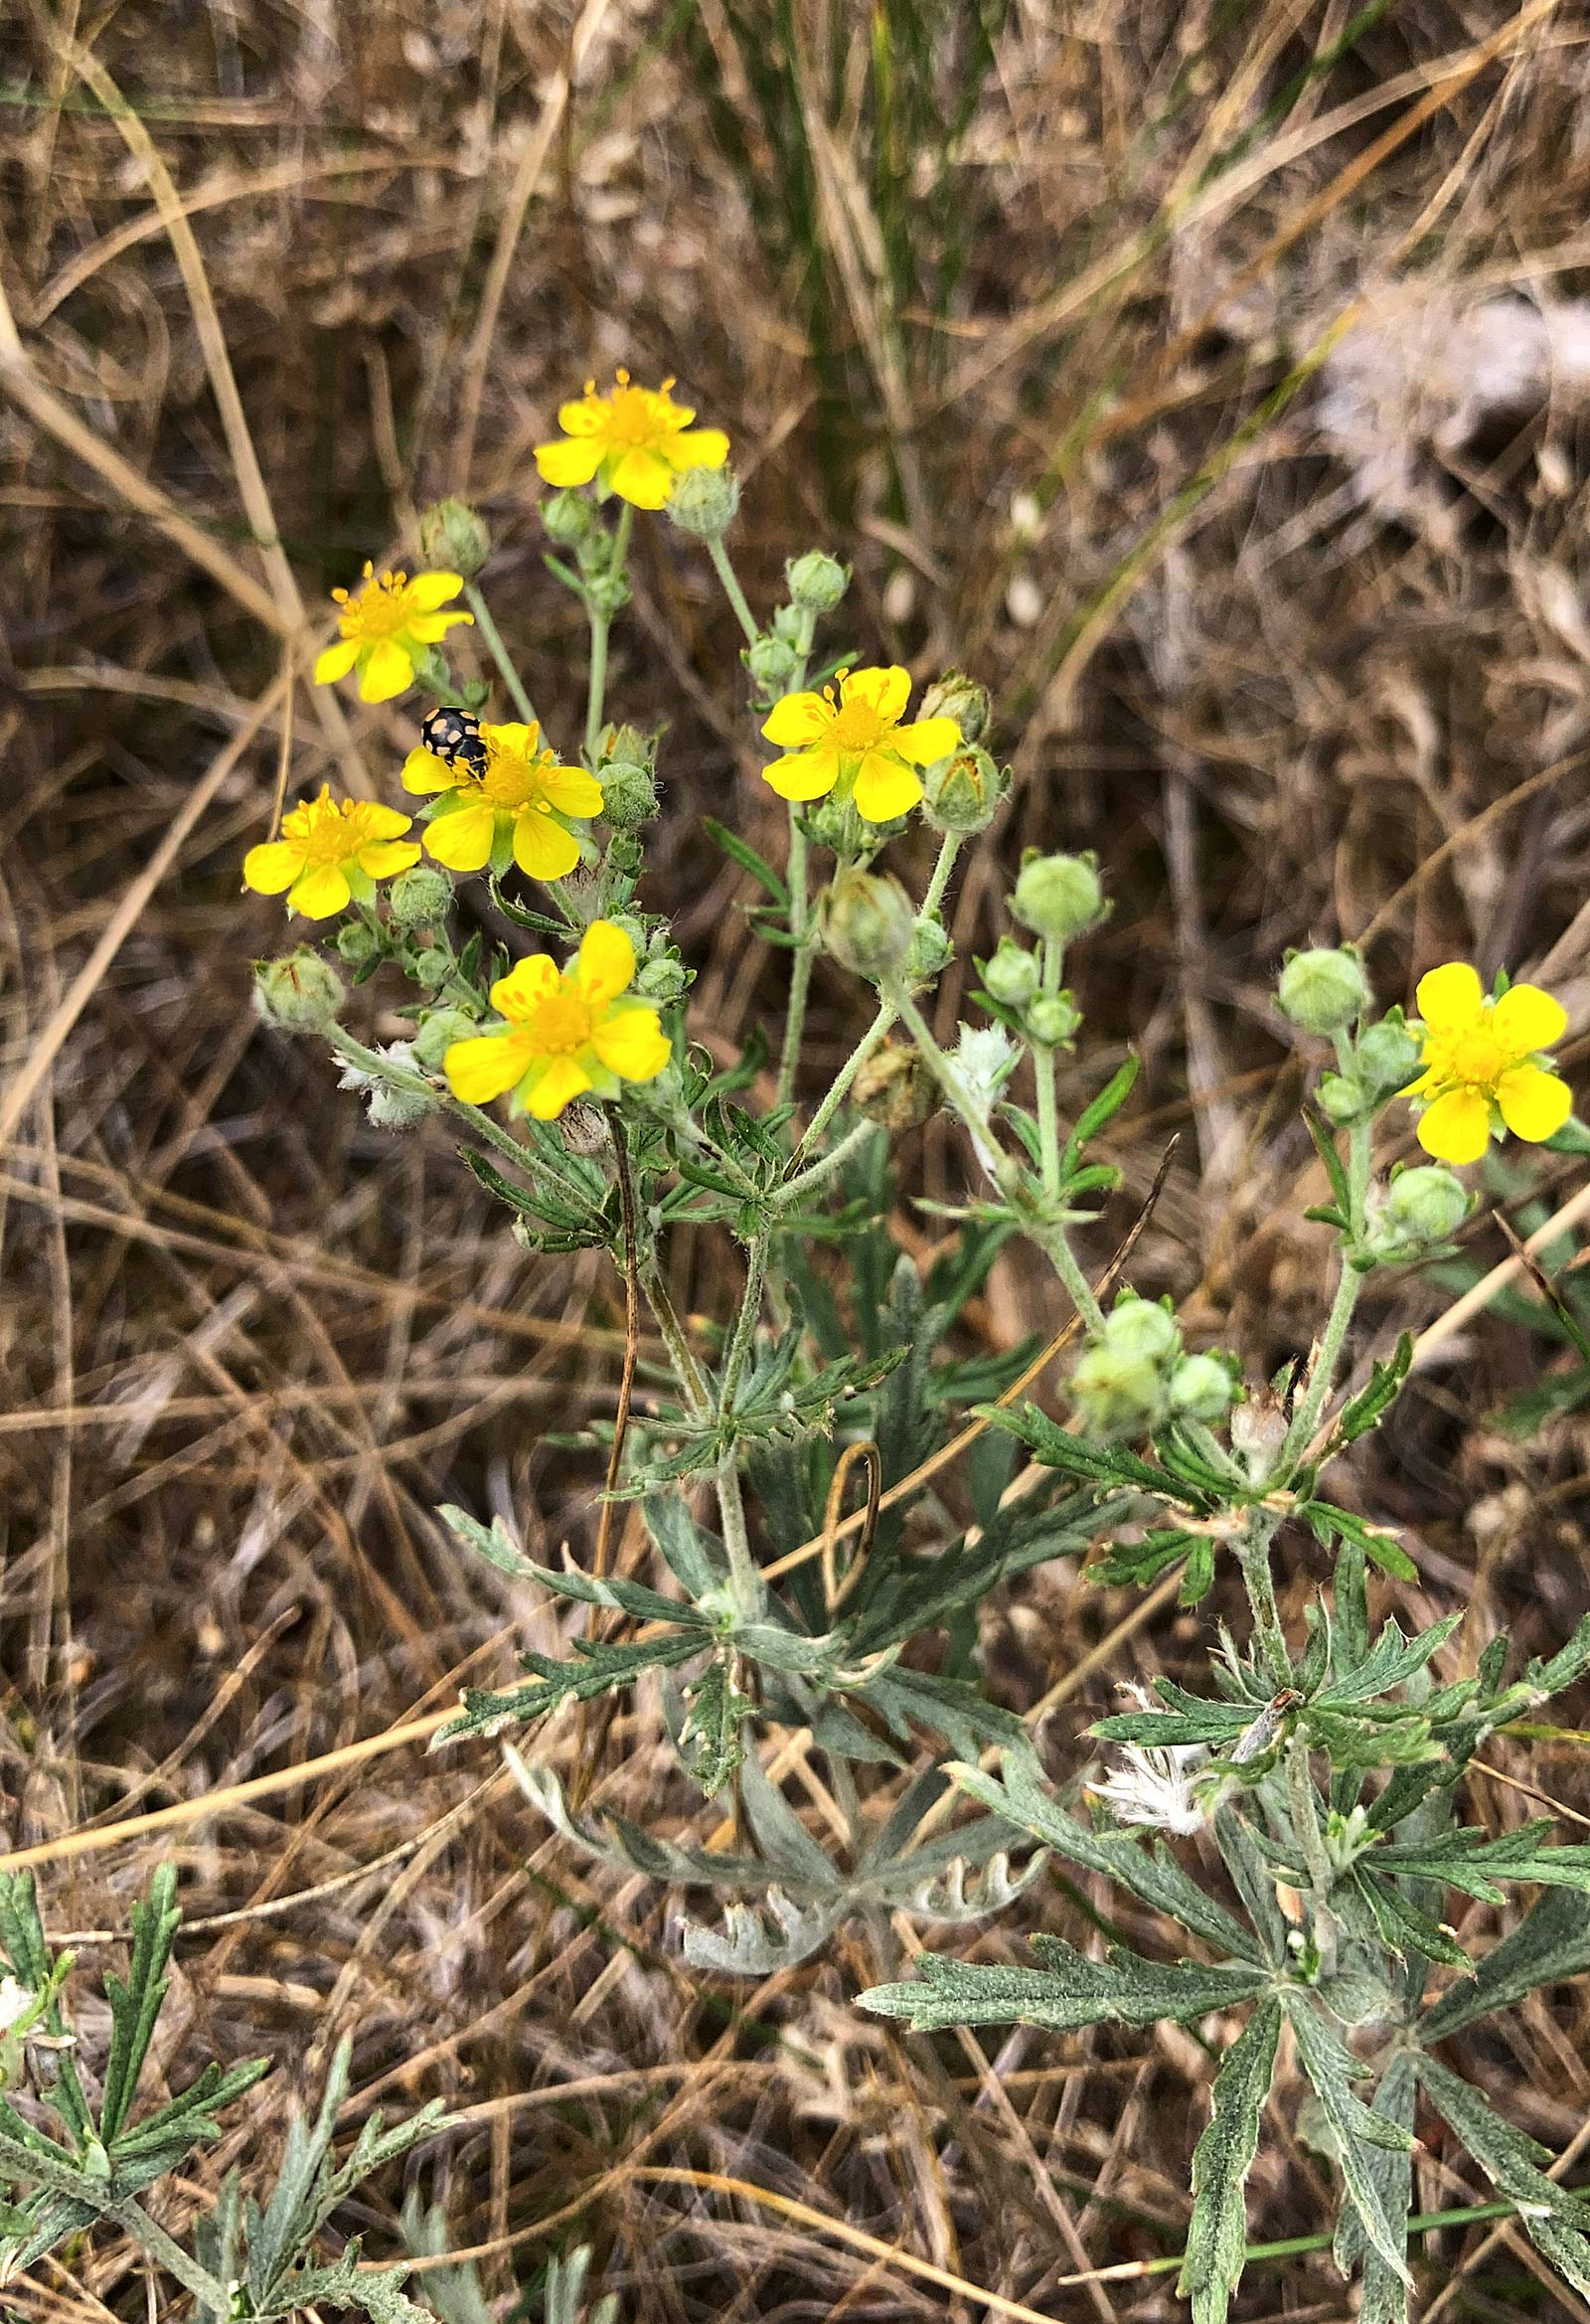 Silber-Fingerkraut (Potentilla argentea) mit Trockenrasen-Marienkäfer (Coccinula quatuordecimpustulata)